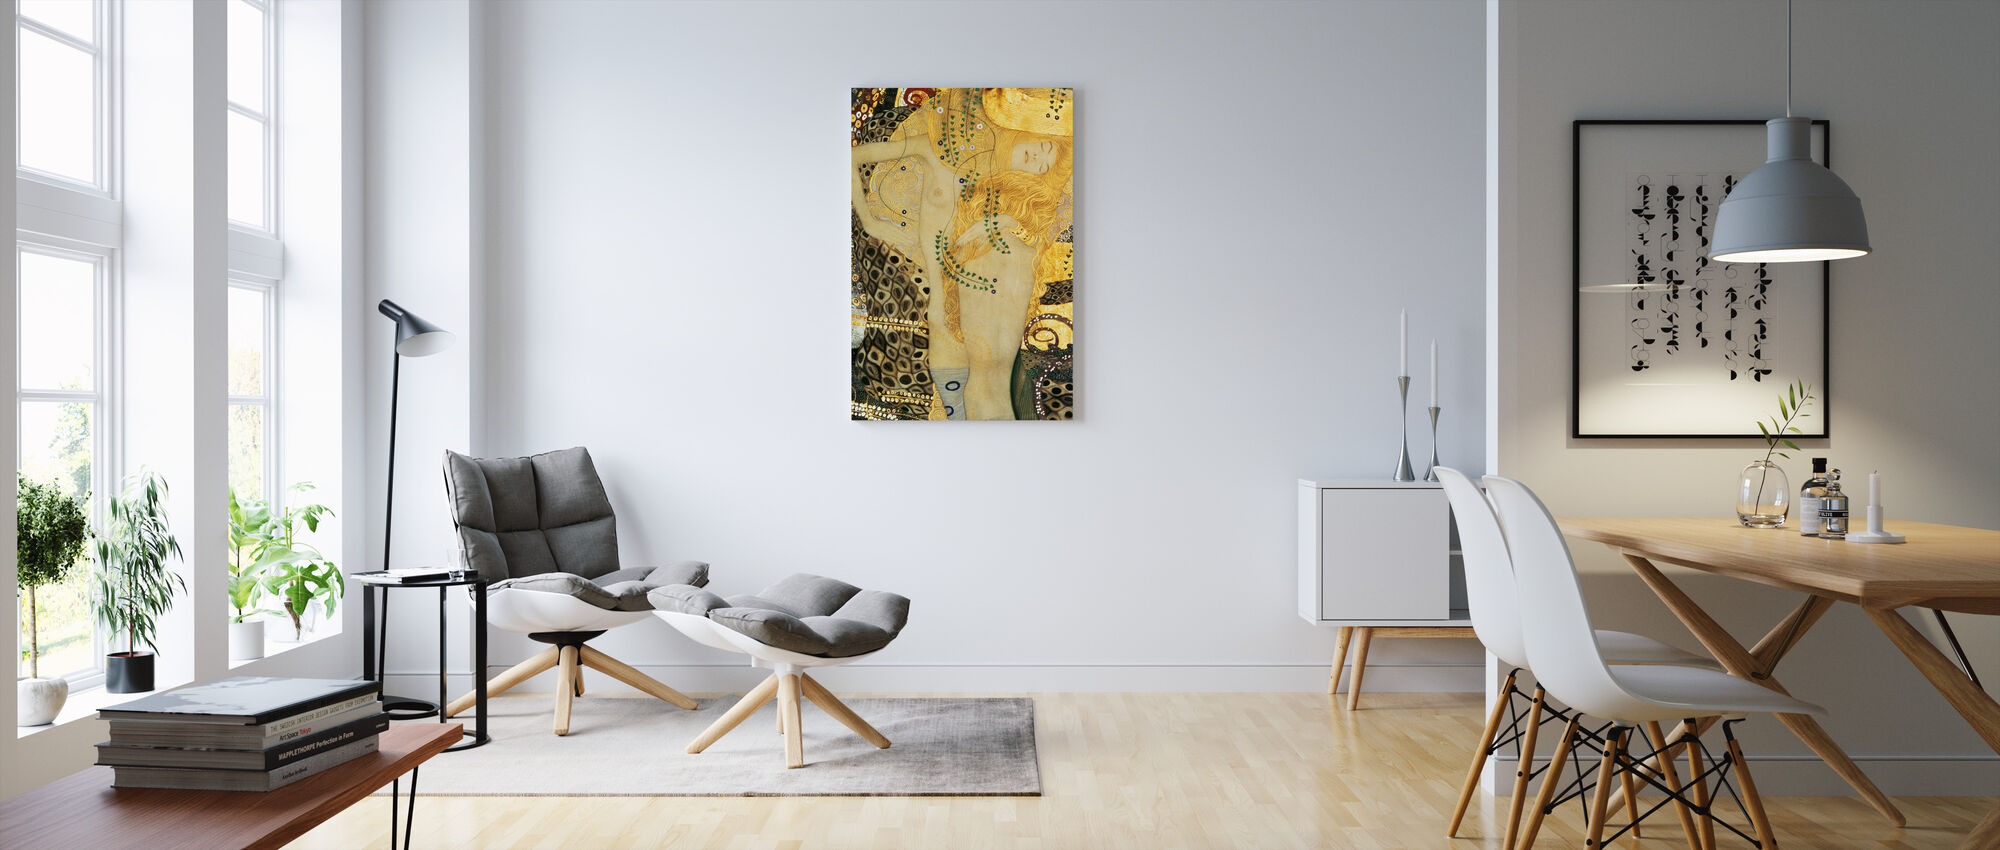 Vandslanger, Gustav Klimt - Lerretsbilde - Stue